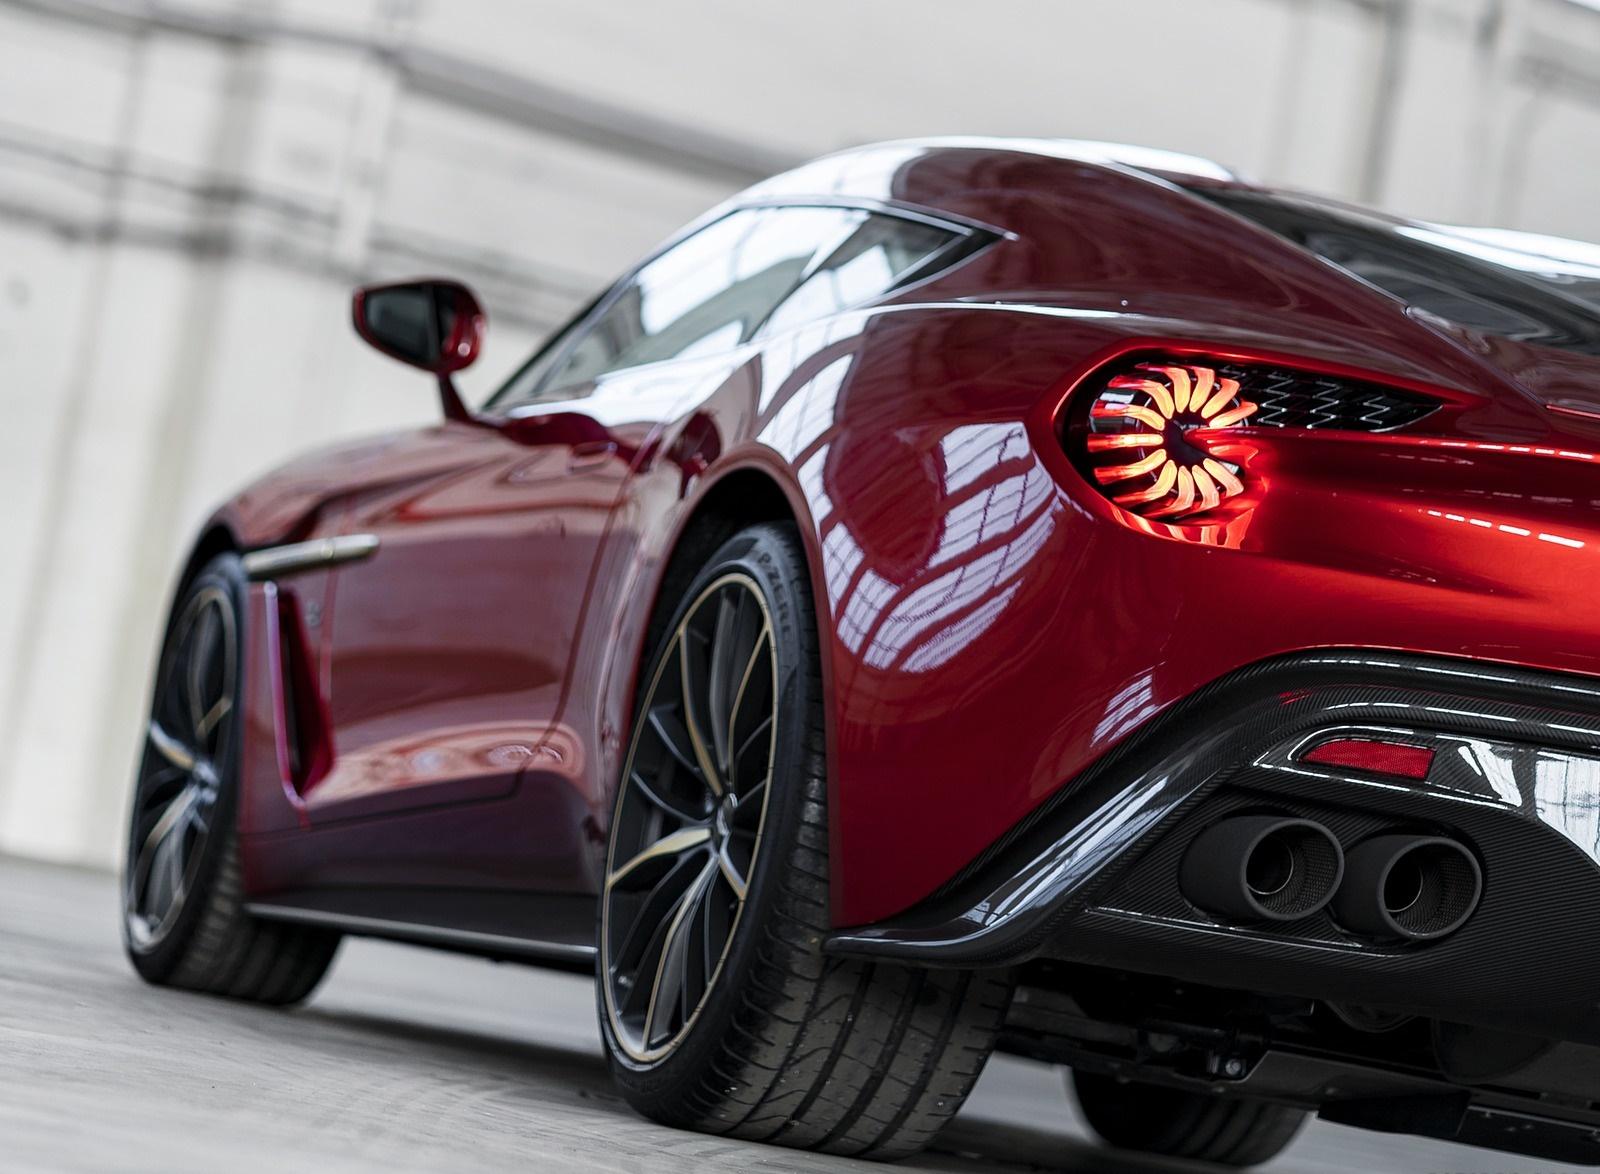 2018 Aston Martin Vanquish Zagato Coupe Tail Light Wallpapers 14 Newcarcars